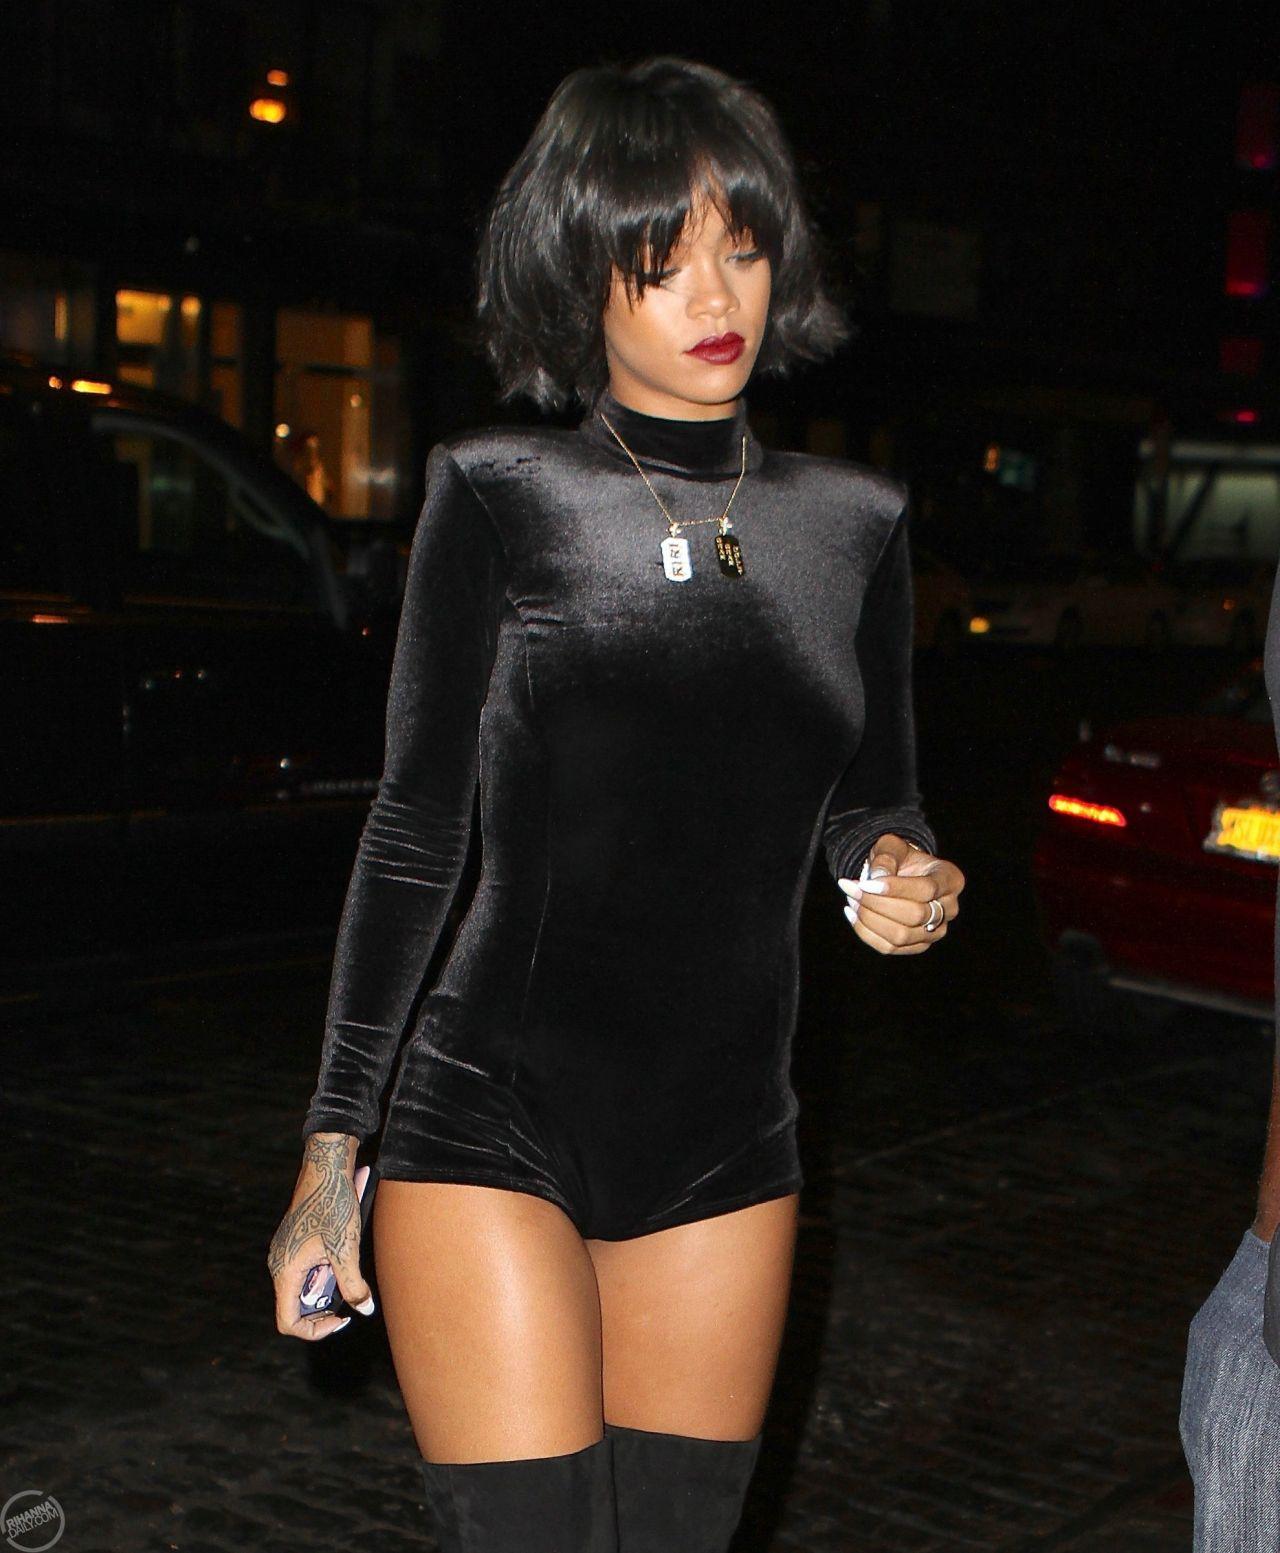 Rihanna Street Style Wearing A Short Jumpsuit In New